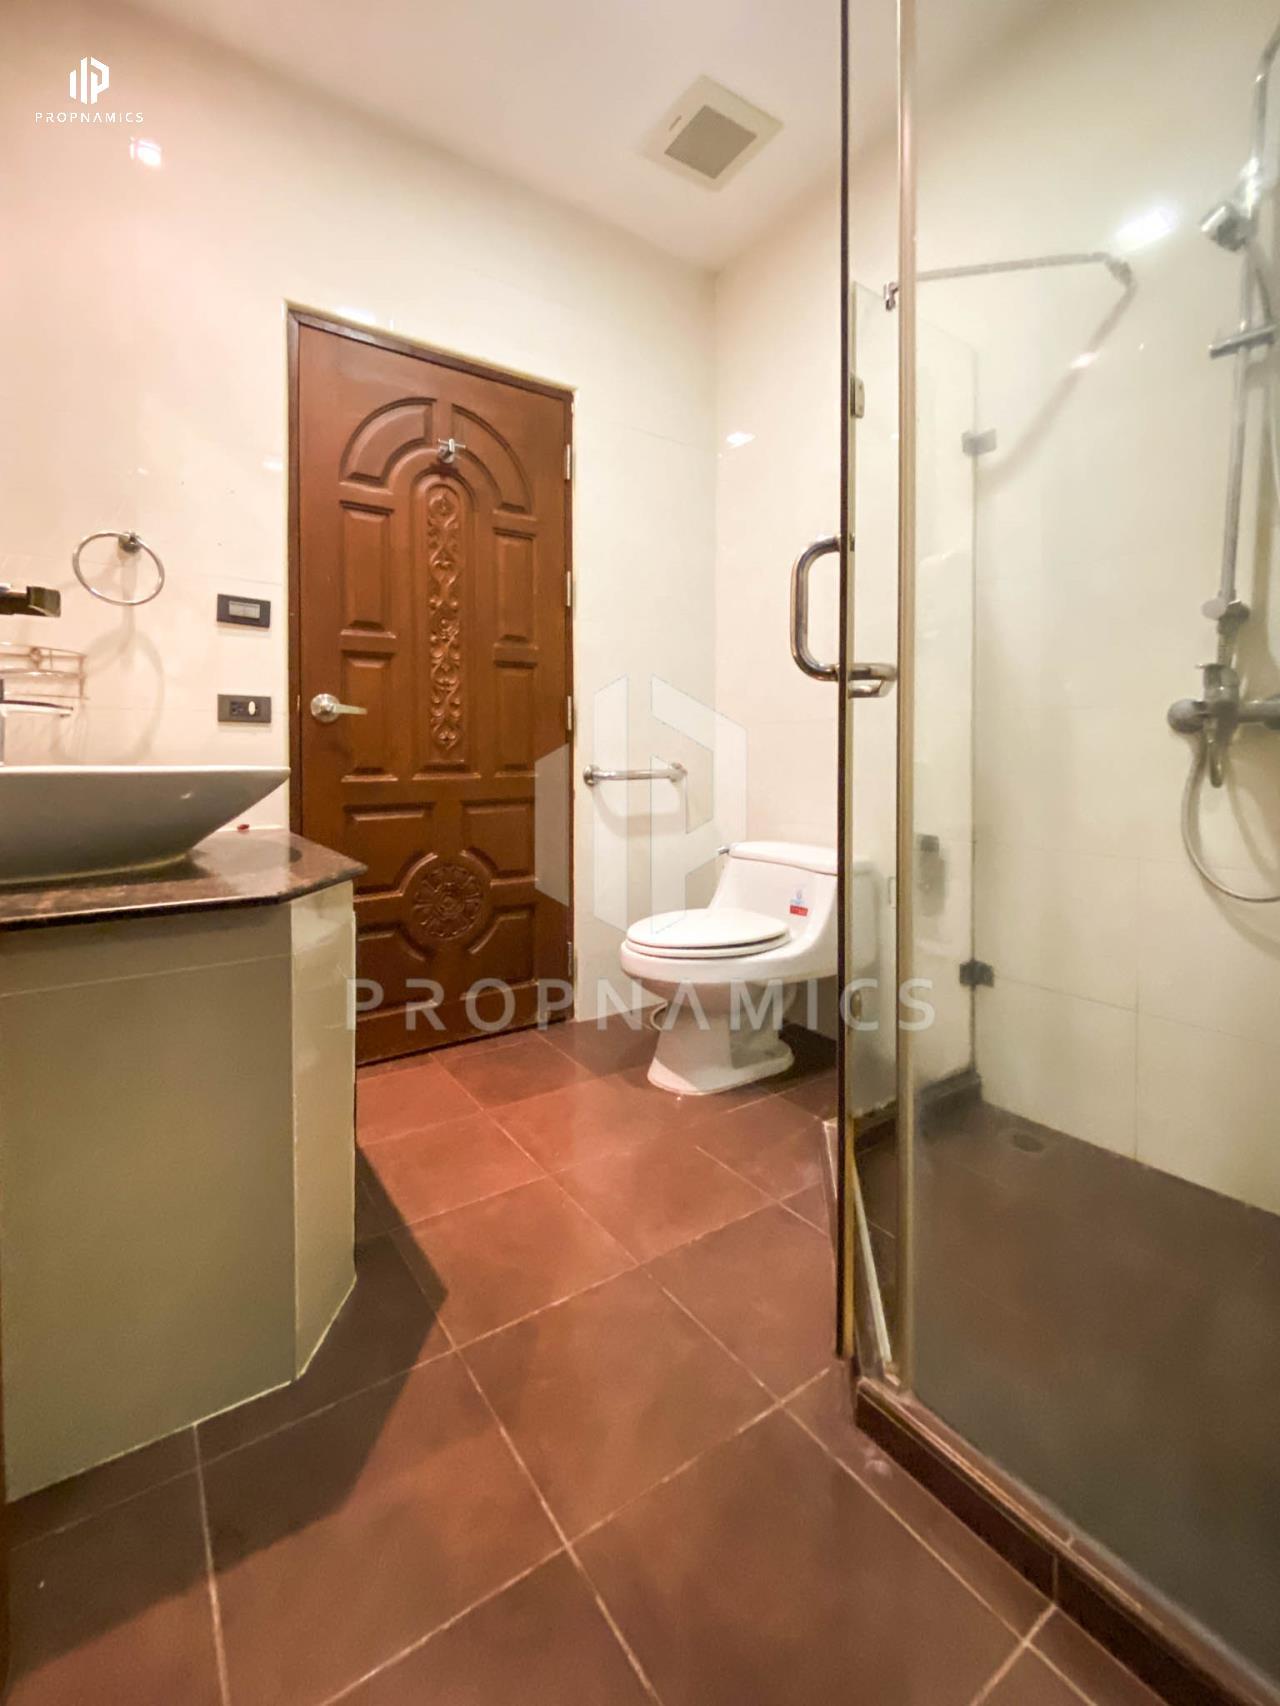 Propnamics Co., Ltd Agency's FOR RENT: SINGLE HOUSE IN SUKHUMVIT 26 17